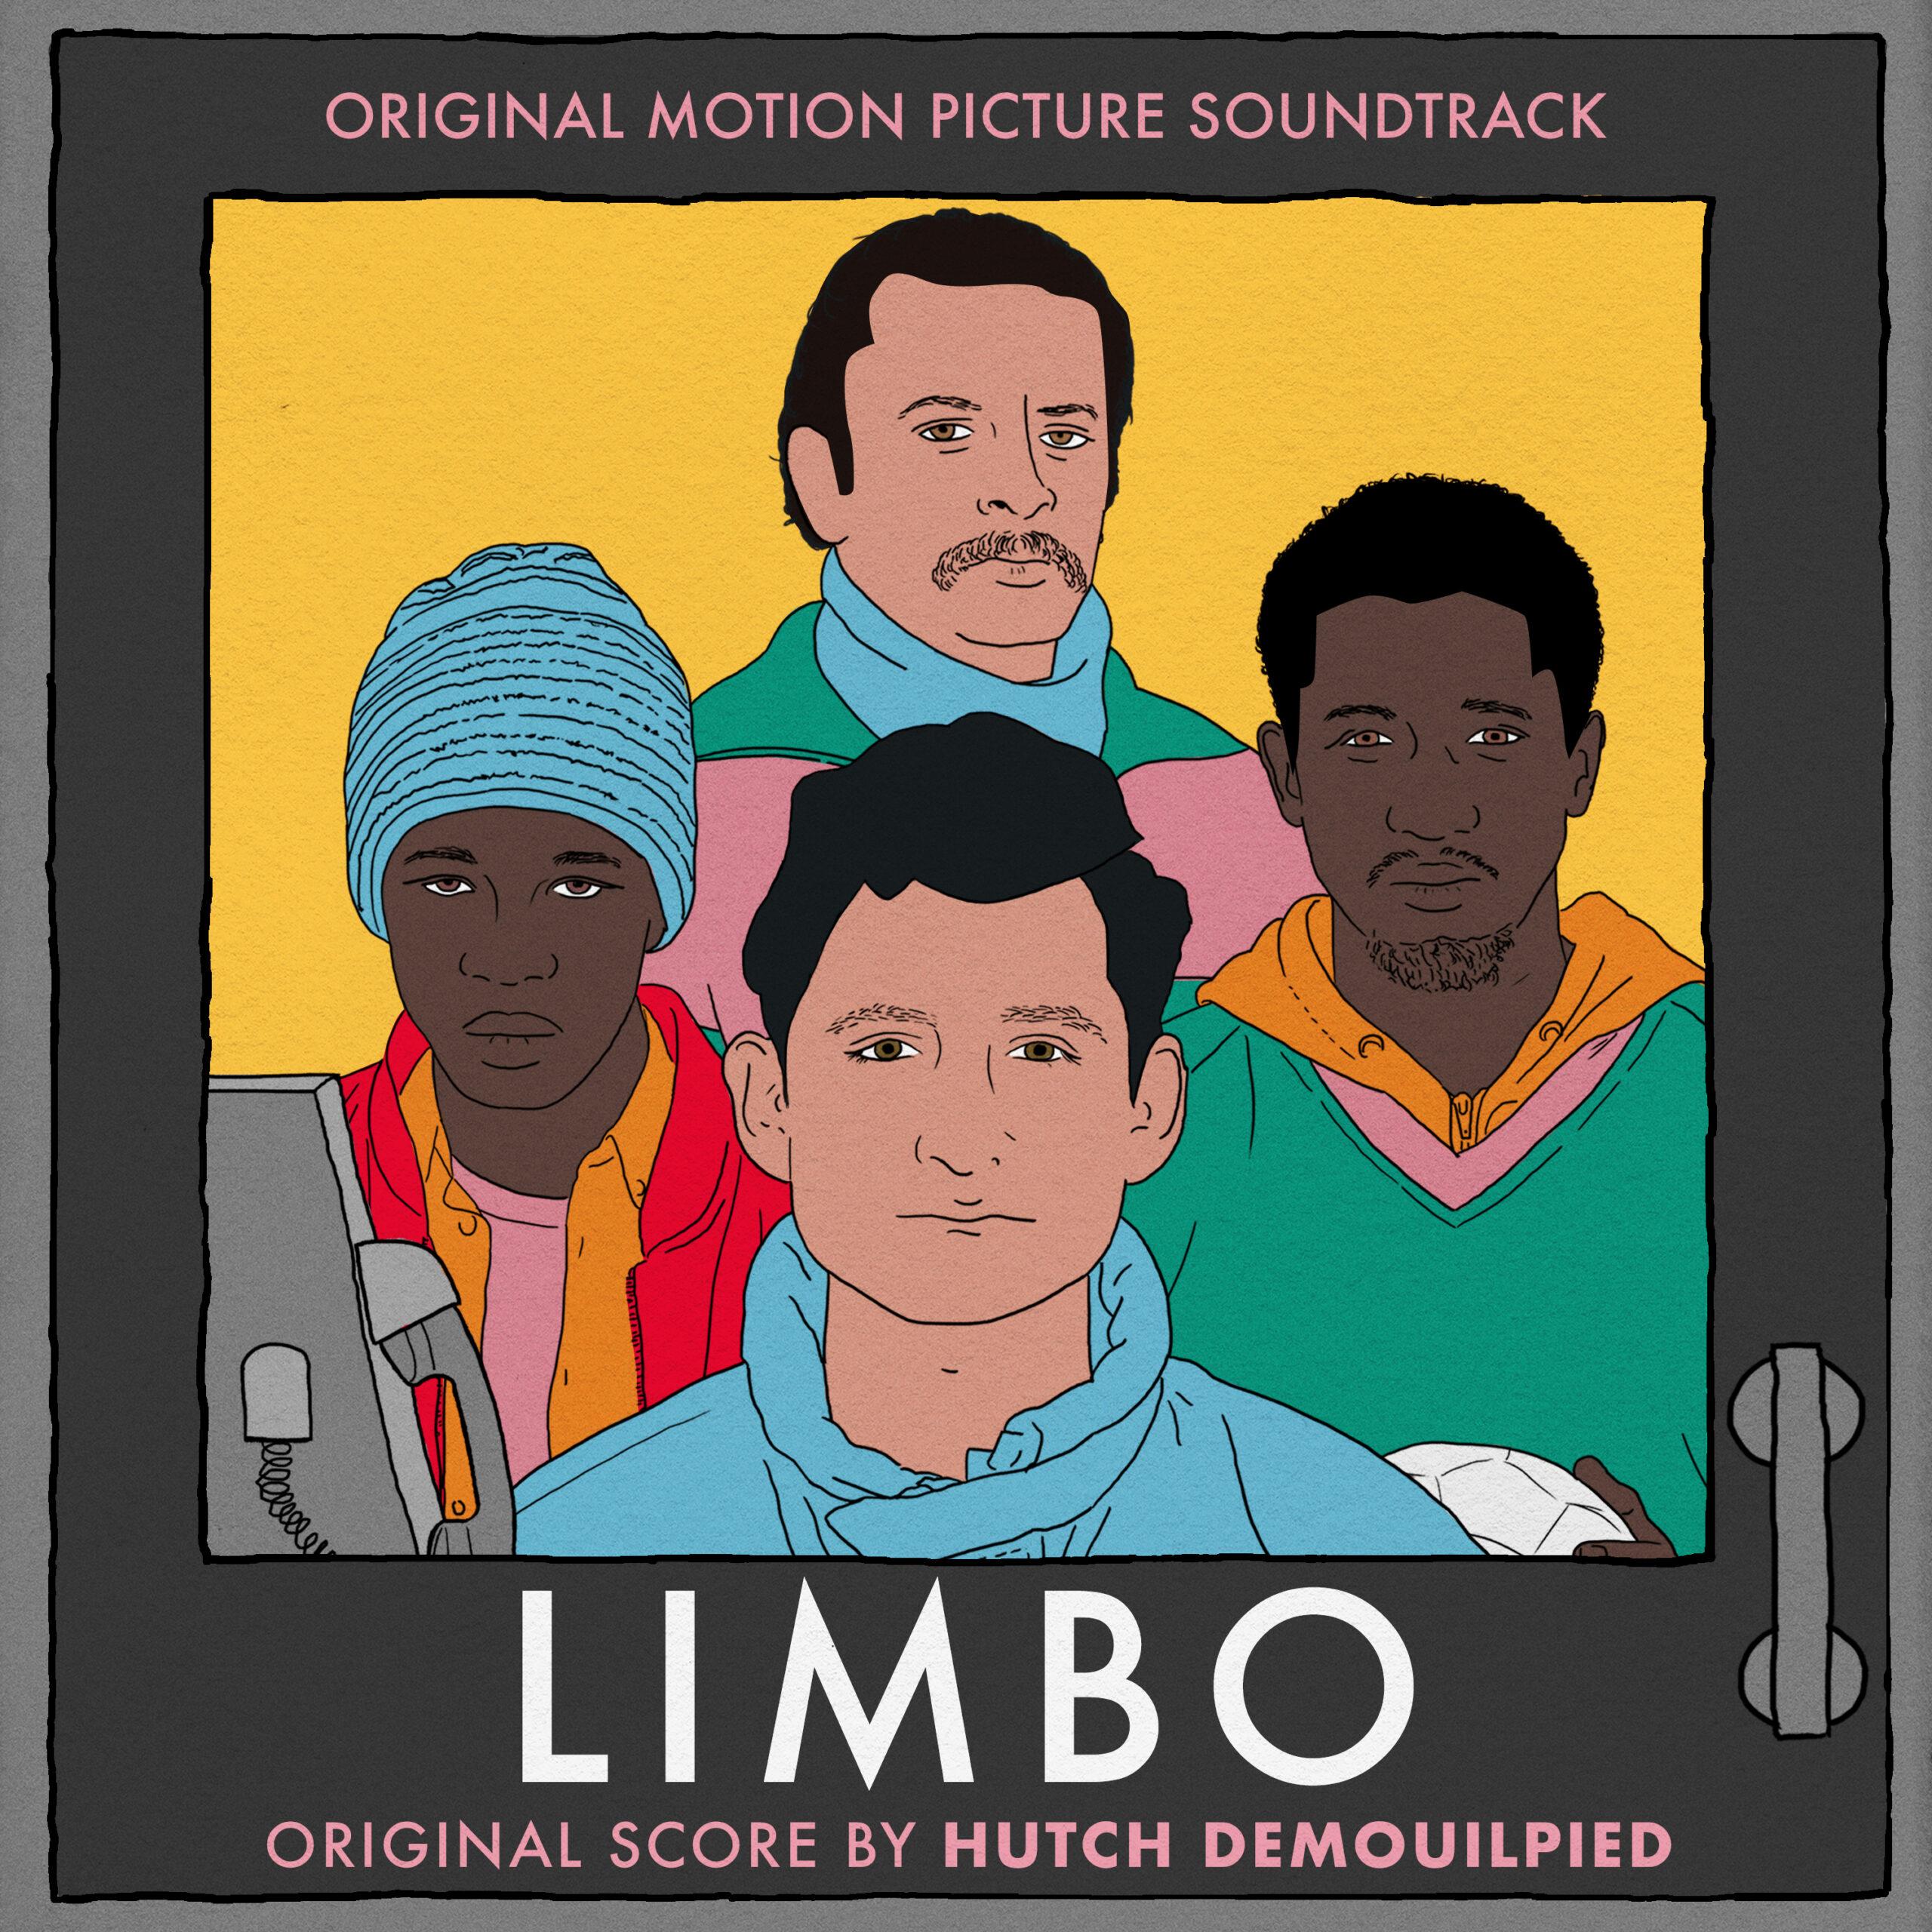 LIMBO SOUNDTRACK-Film Music Reporter